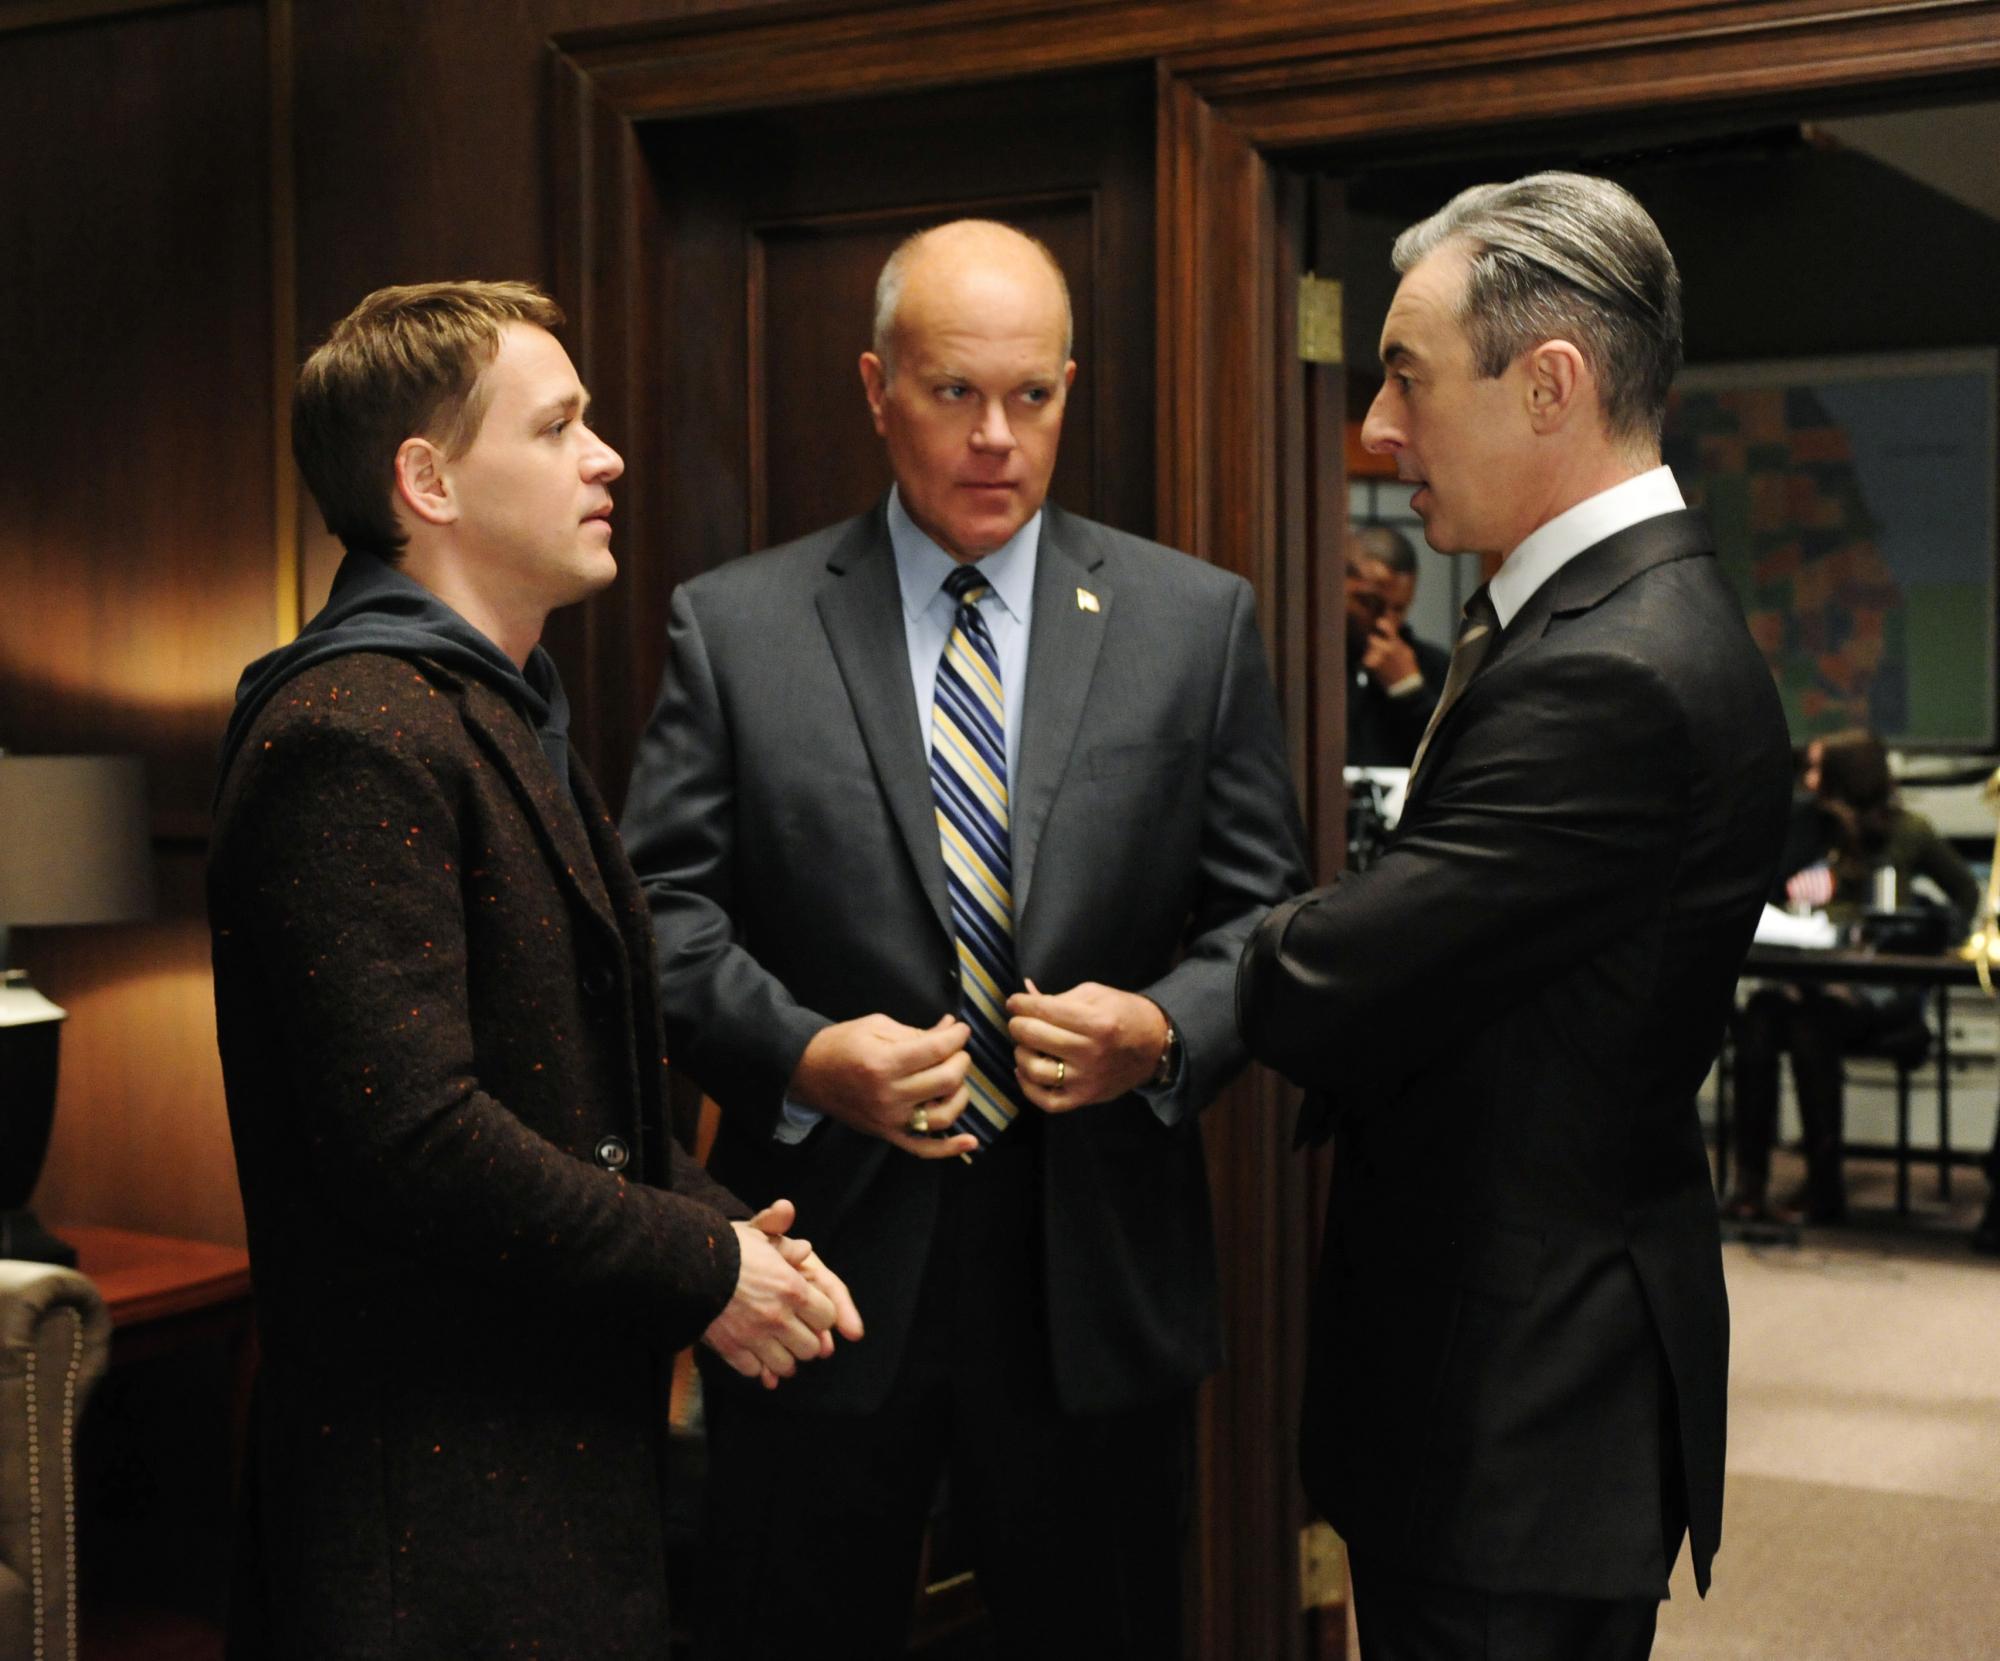 Eli Speaks with Frank Landau and Jordan Karahalios